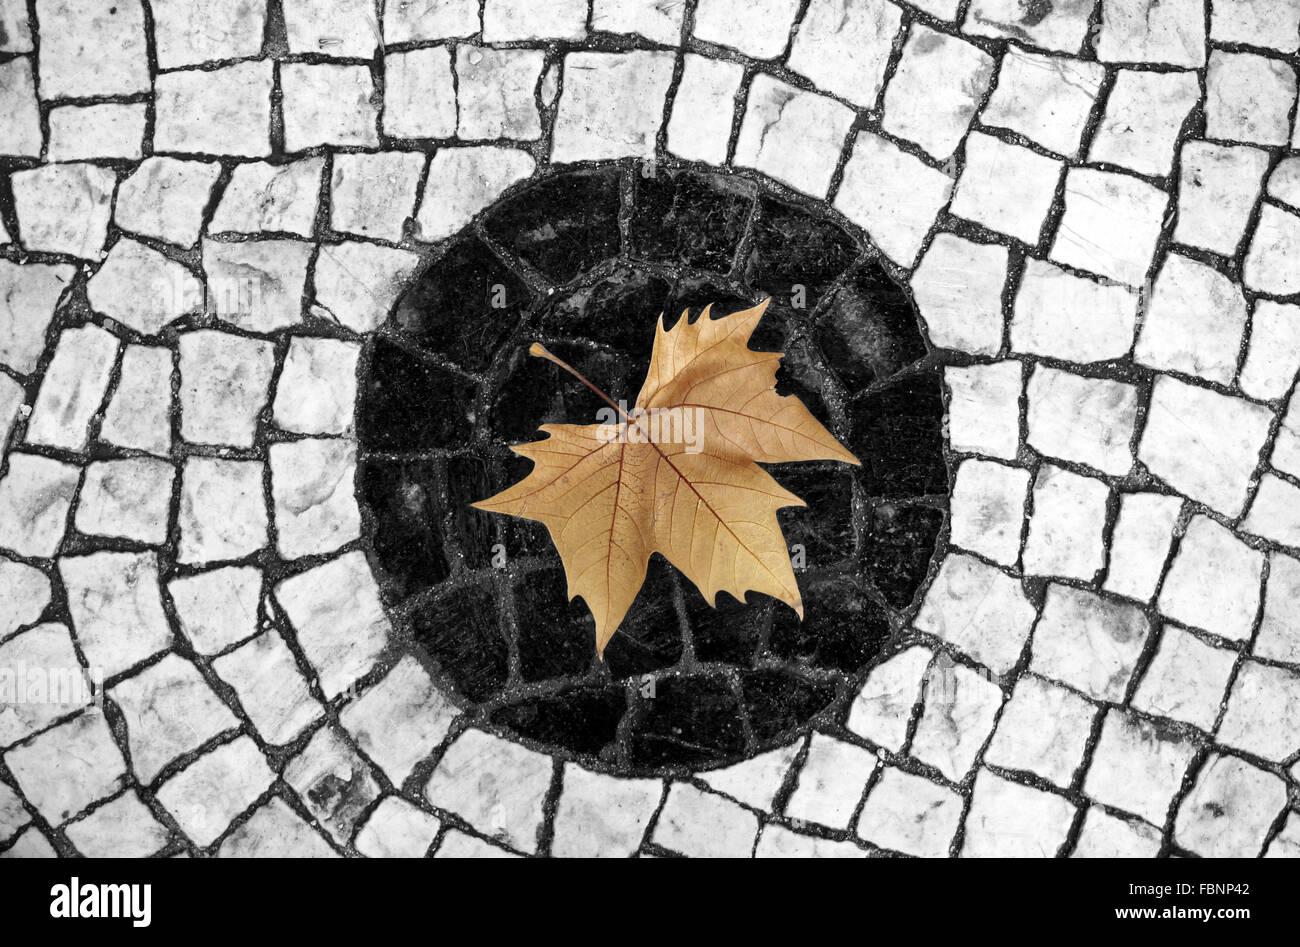 Dry Leaf On Cobblestone - Stock Image